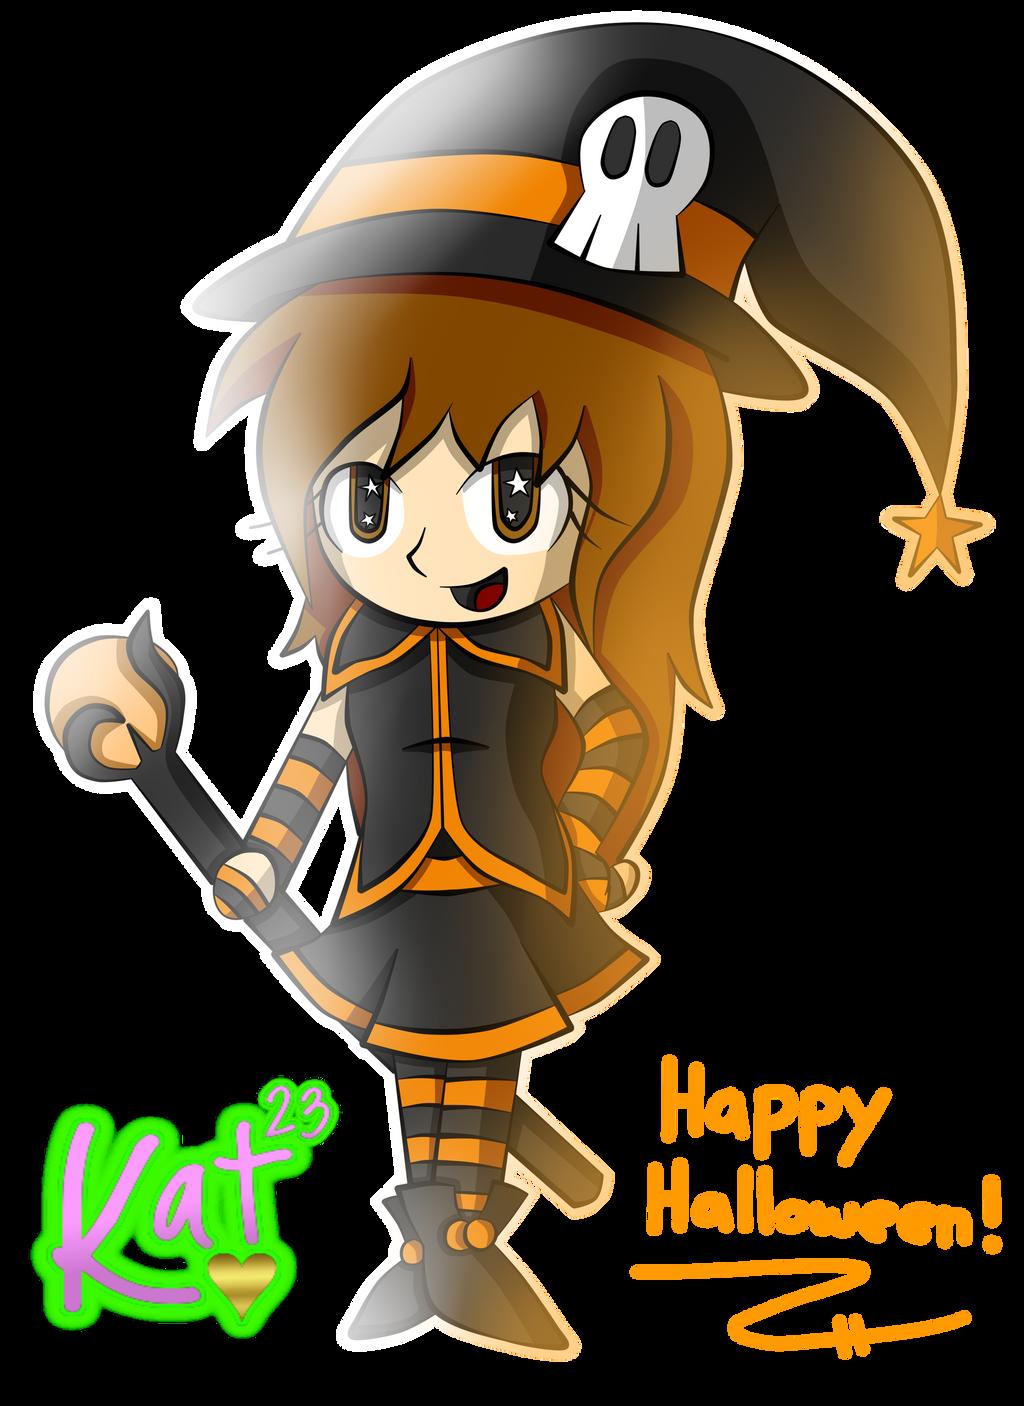 Halloween ID '14 by Katrins23